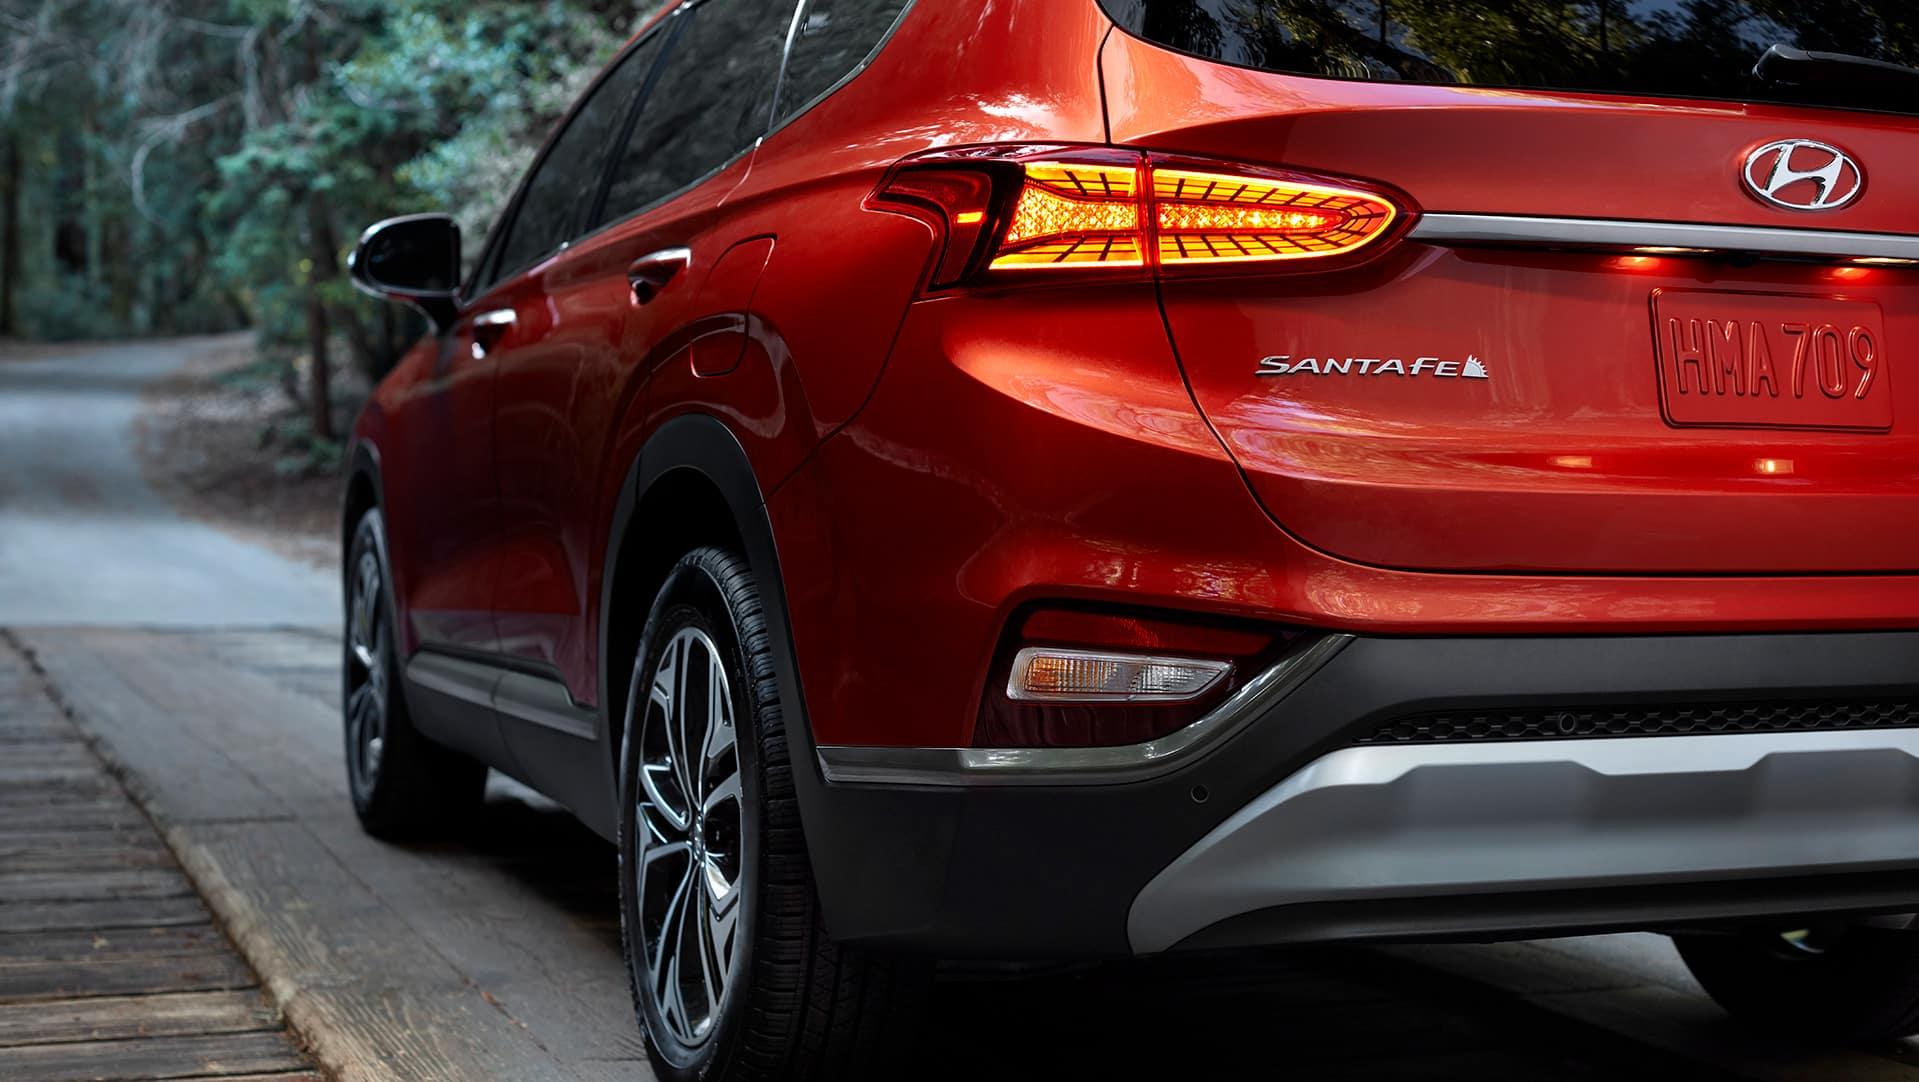 2020 Santa Fe - Features & Trims | Boch Hyundai in Norwood